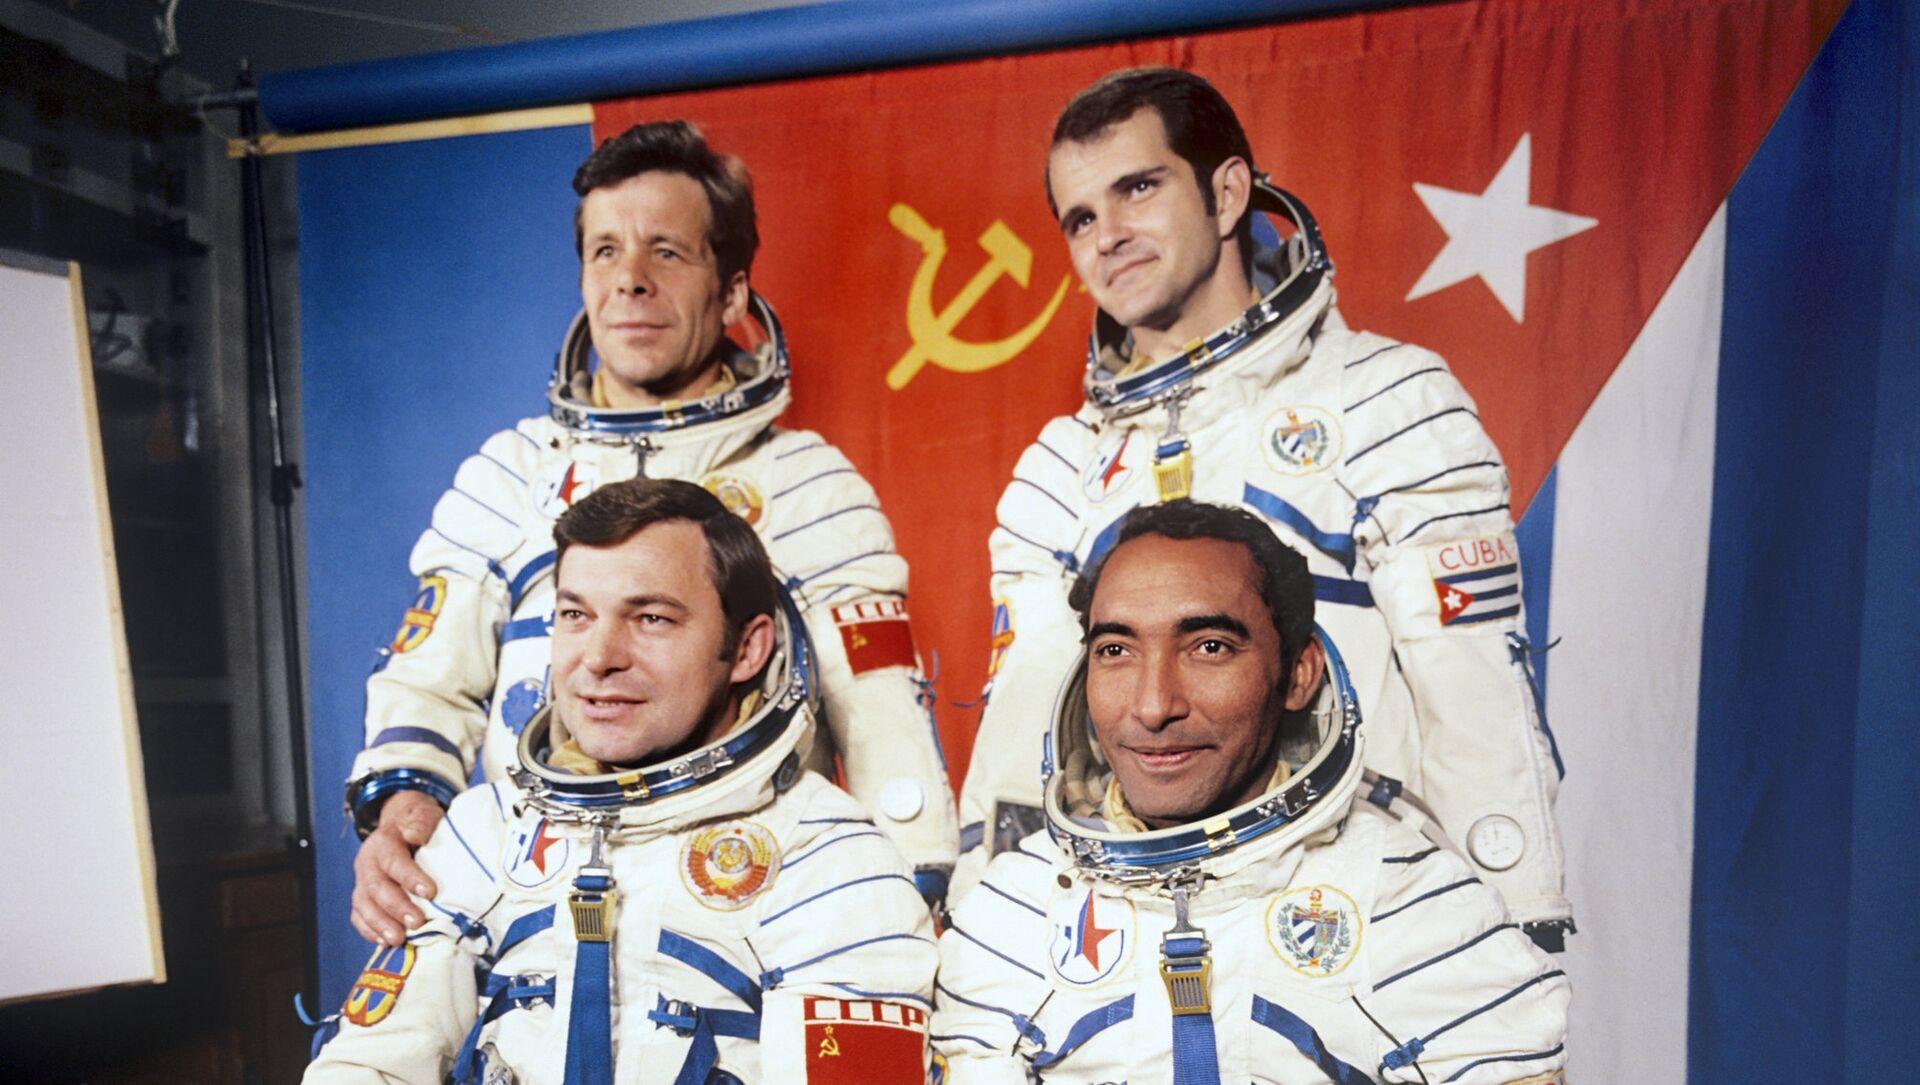 El cosmonauta Arnaldo Tamayo junto al héroe soviético, Yuri Romanenko, y sus traductores en la Tierra - Sputnik Mundo, 1920, 12.04.2019